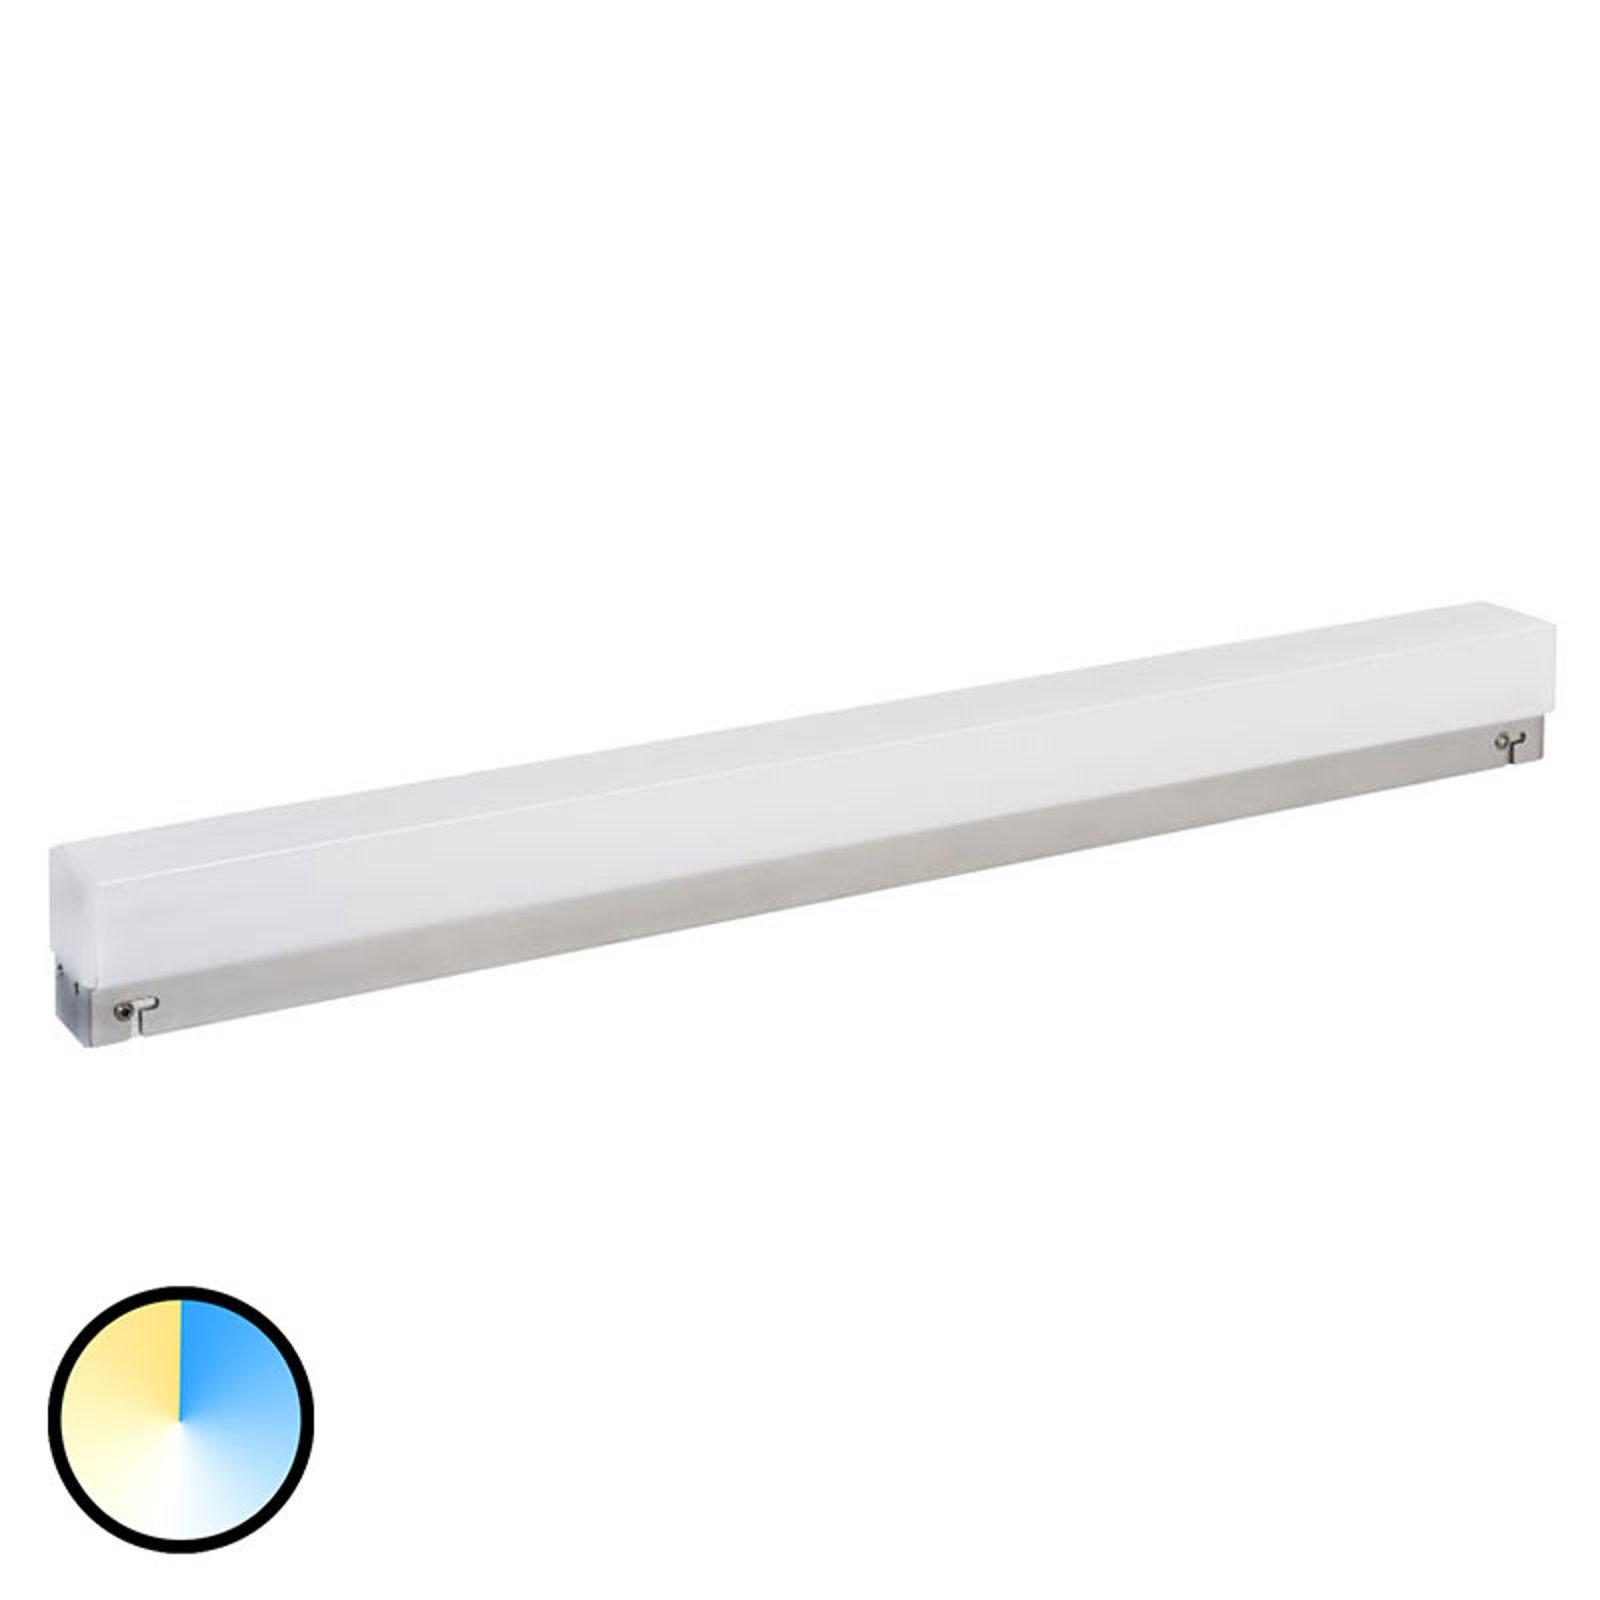 Mirror Light Switch Tone speillampe 60cm sølv